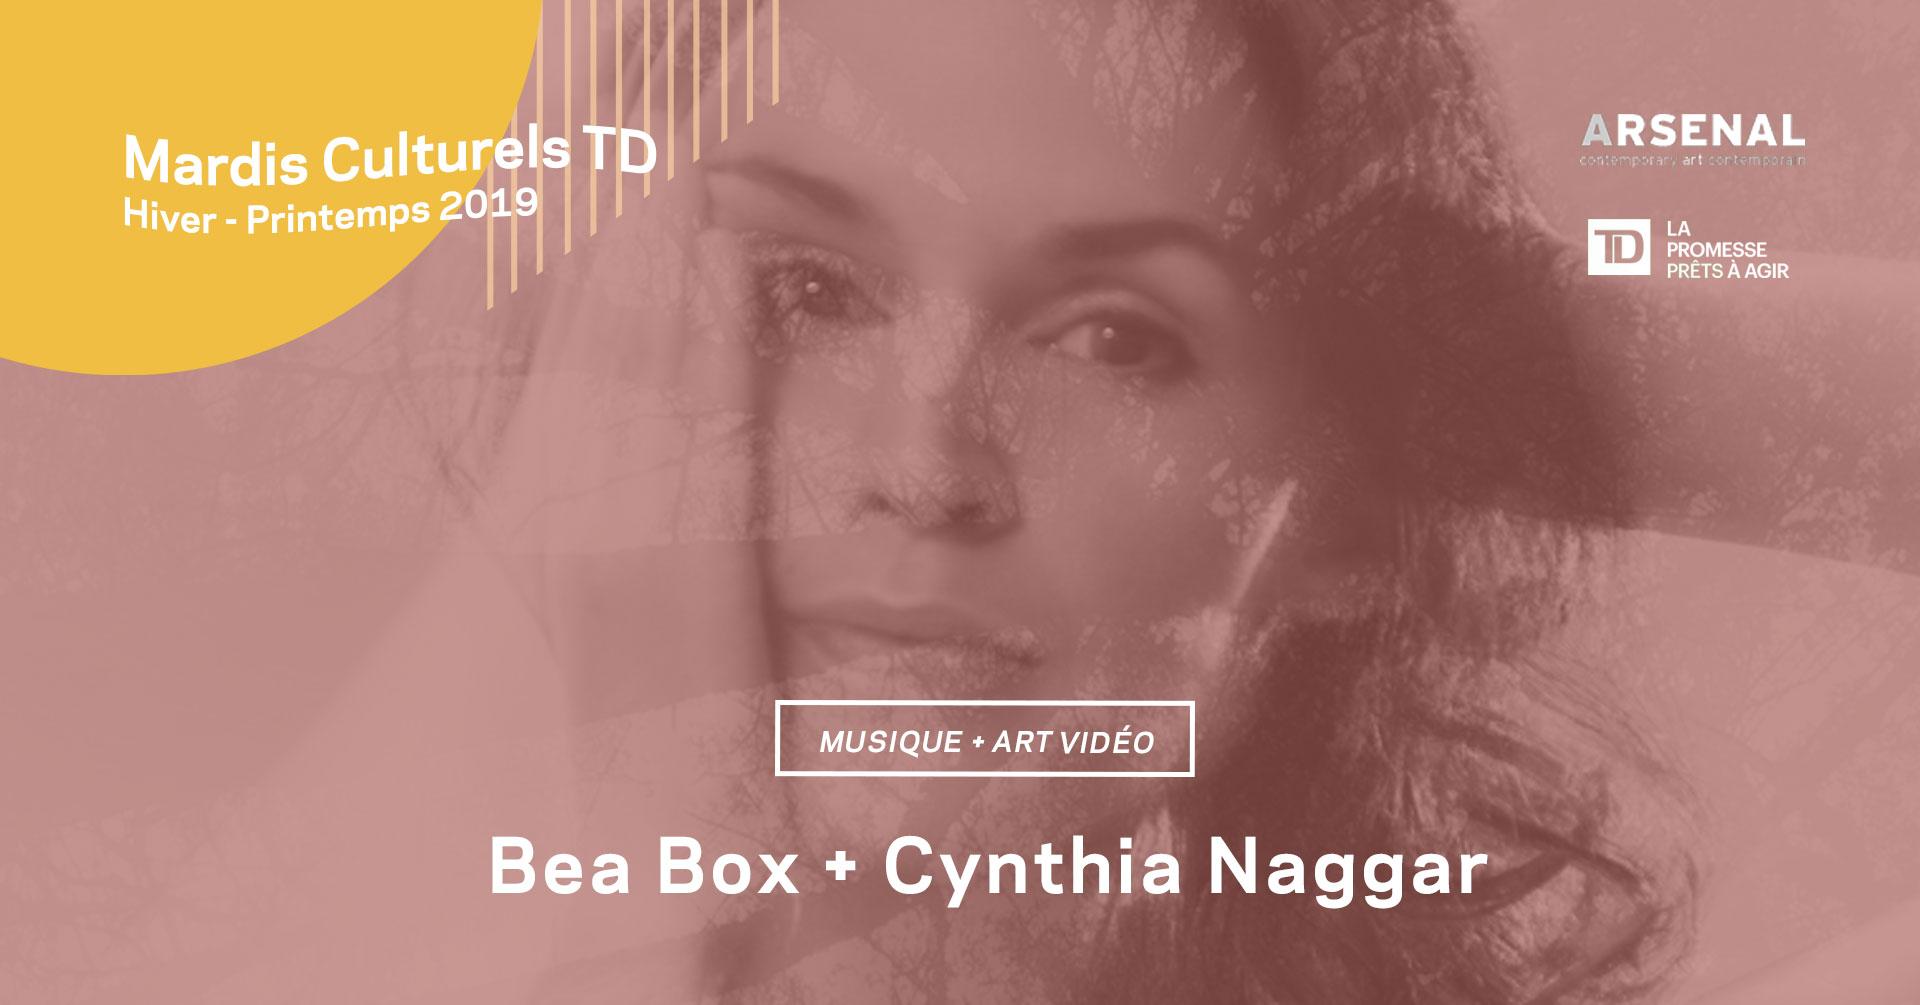 mctd-bea-box-cynthia-naggar.jpg